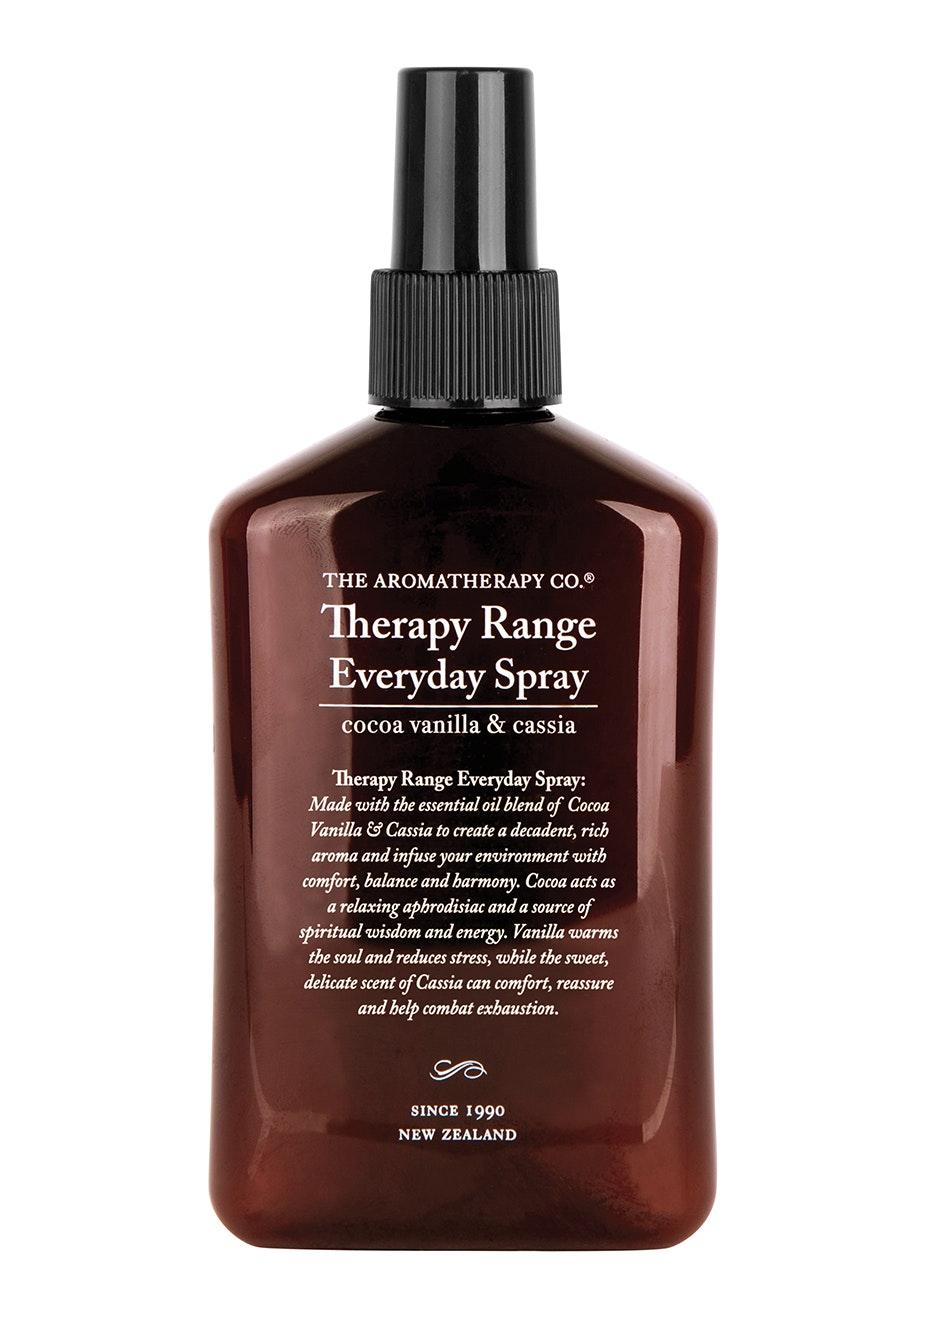 The Aromatherapy Co. Therapy Everyday Spray - Cocoa Vanilla & Cassia  - 250ml